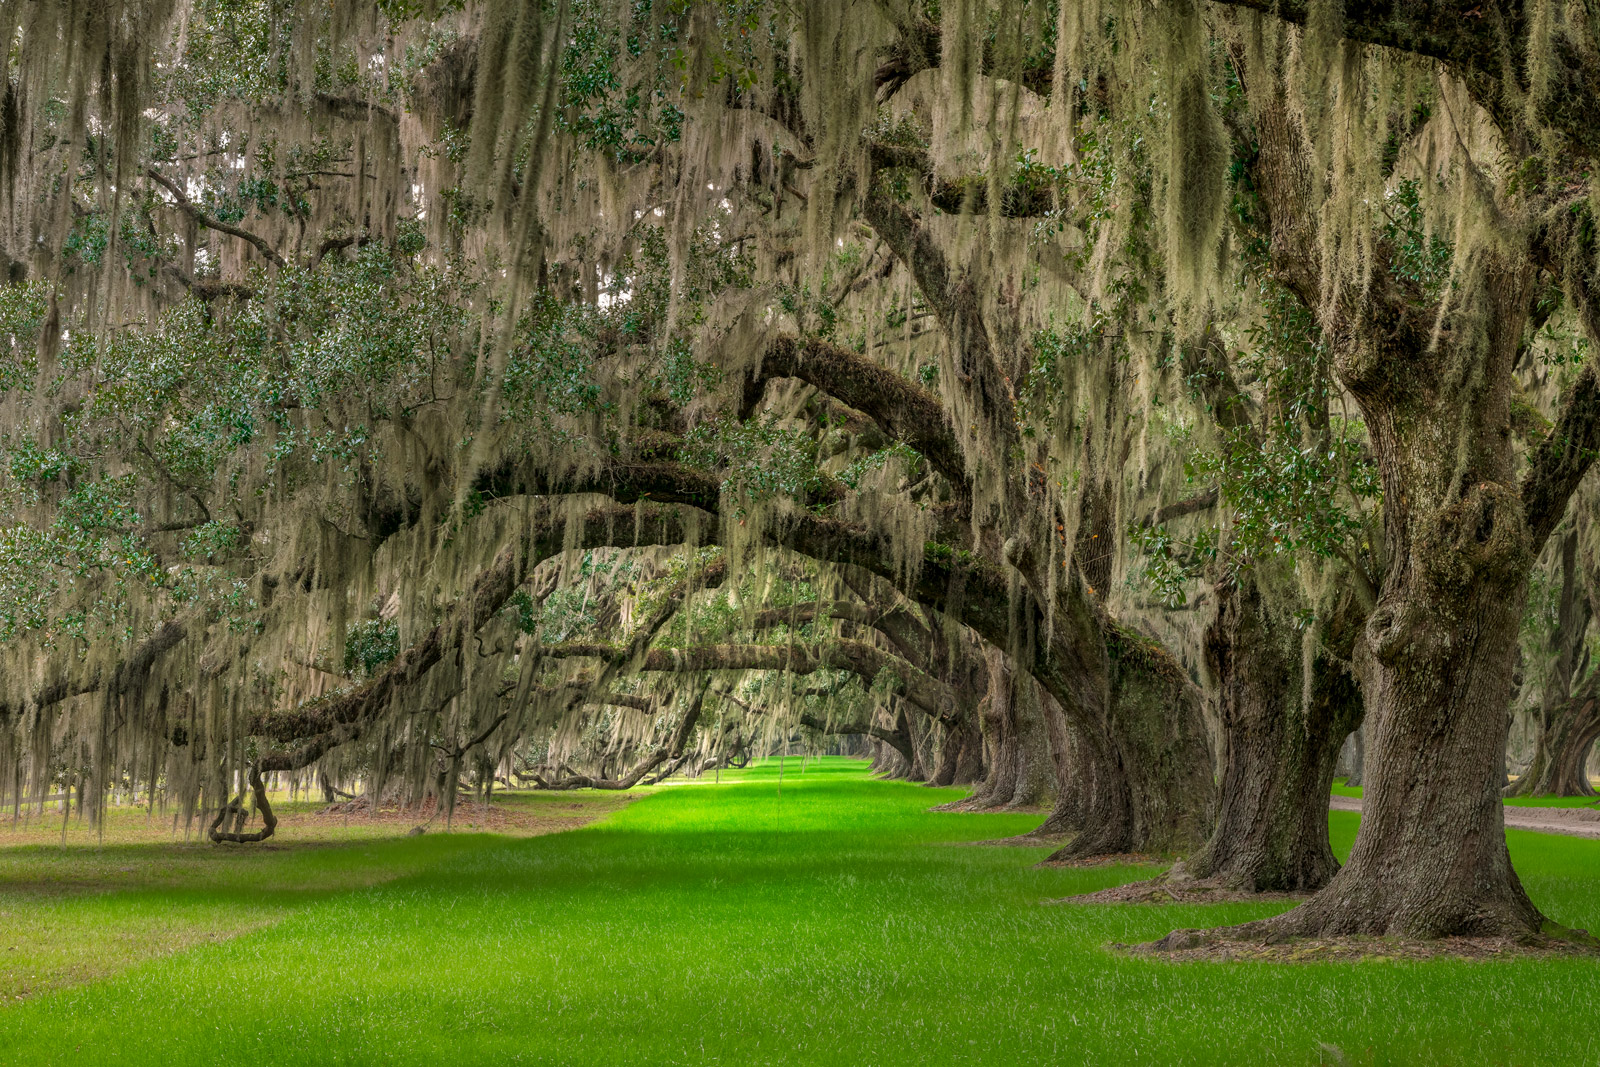 South Carolina, Oak, Trees, Tomotley, Plantation, photo